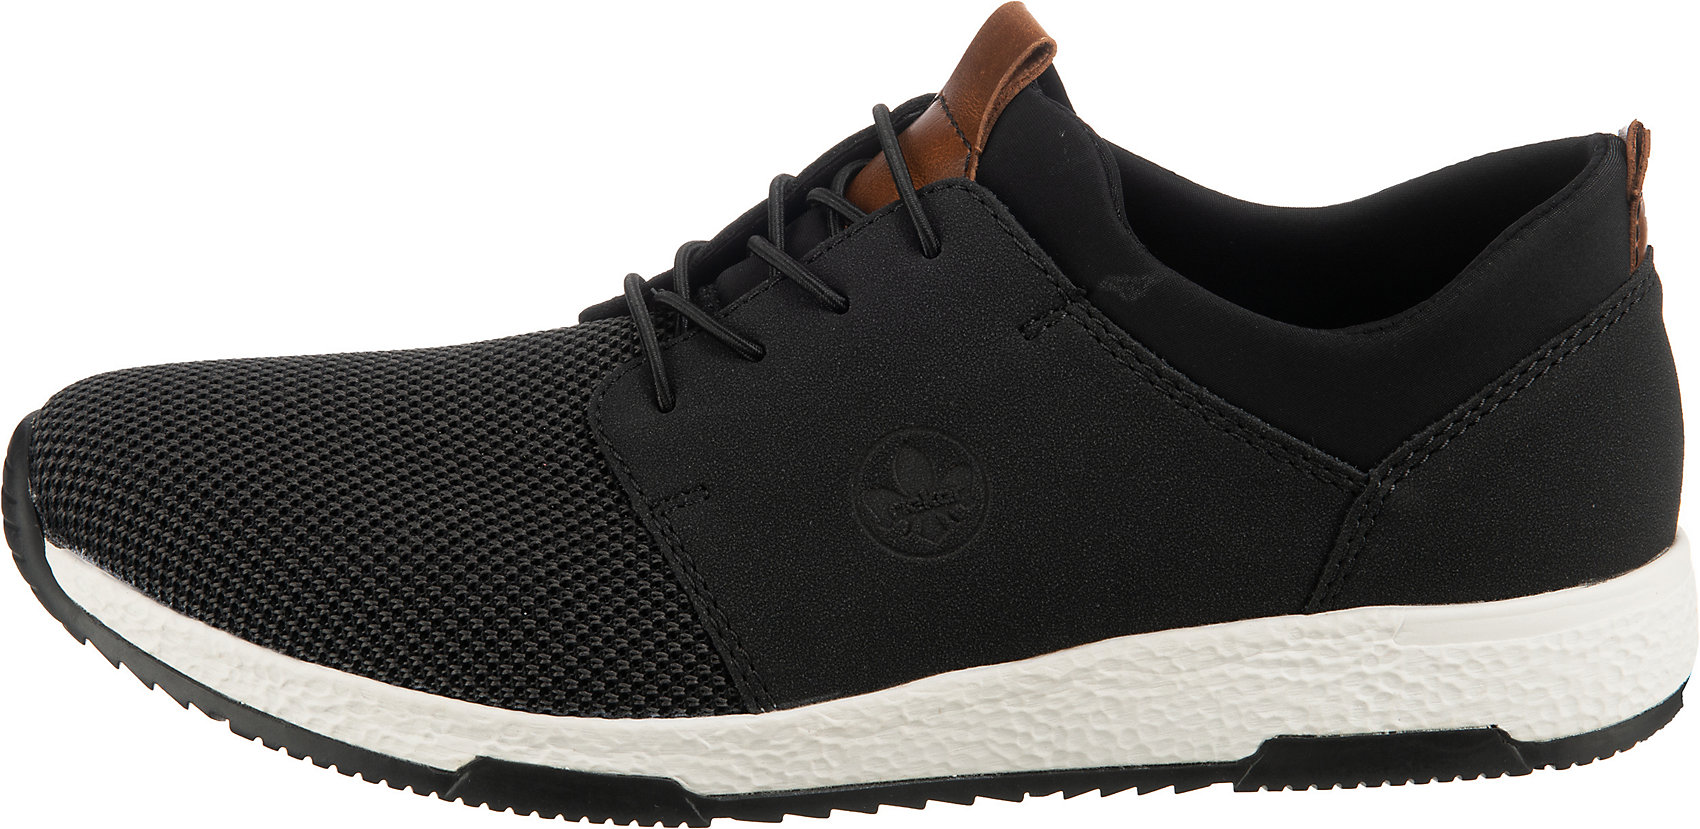 Indexbild 9 - Neu rieker Sneakers Low 12842477 für Herren schwarz